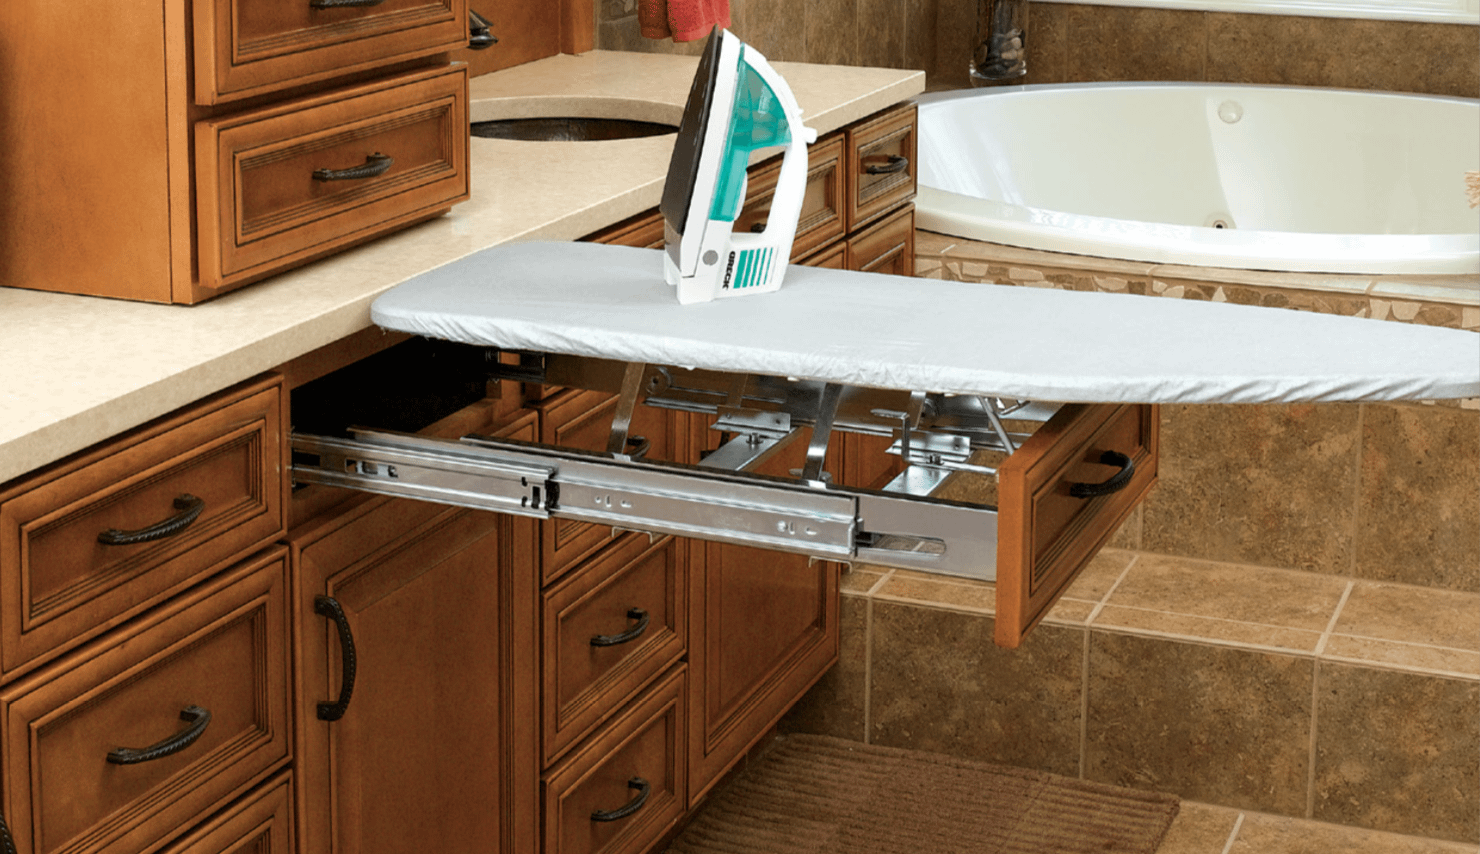 bathroom storage - ironing board